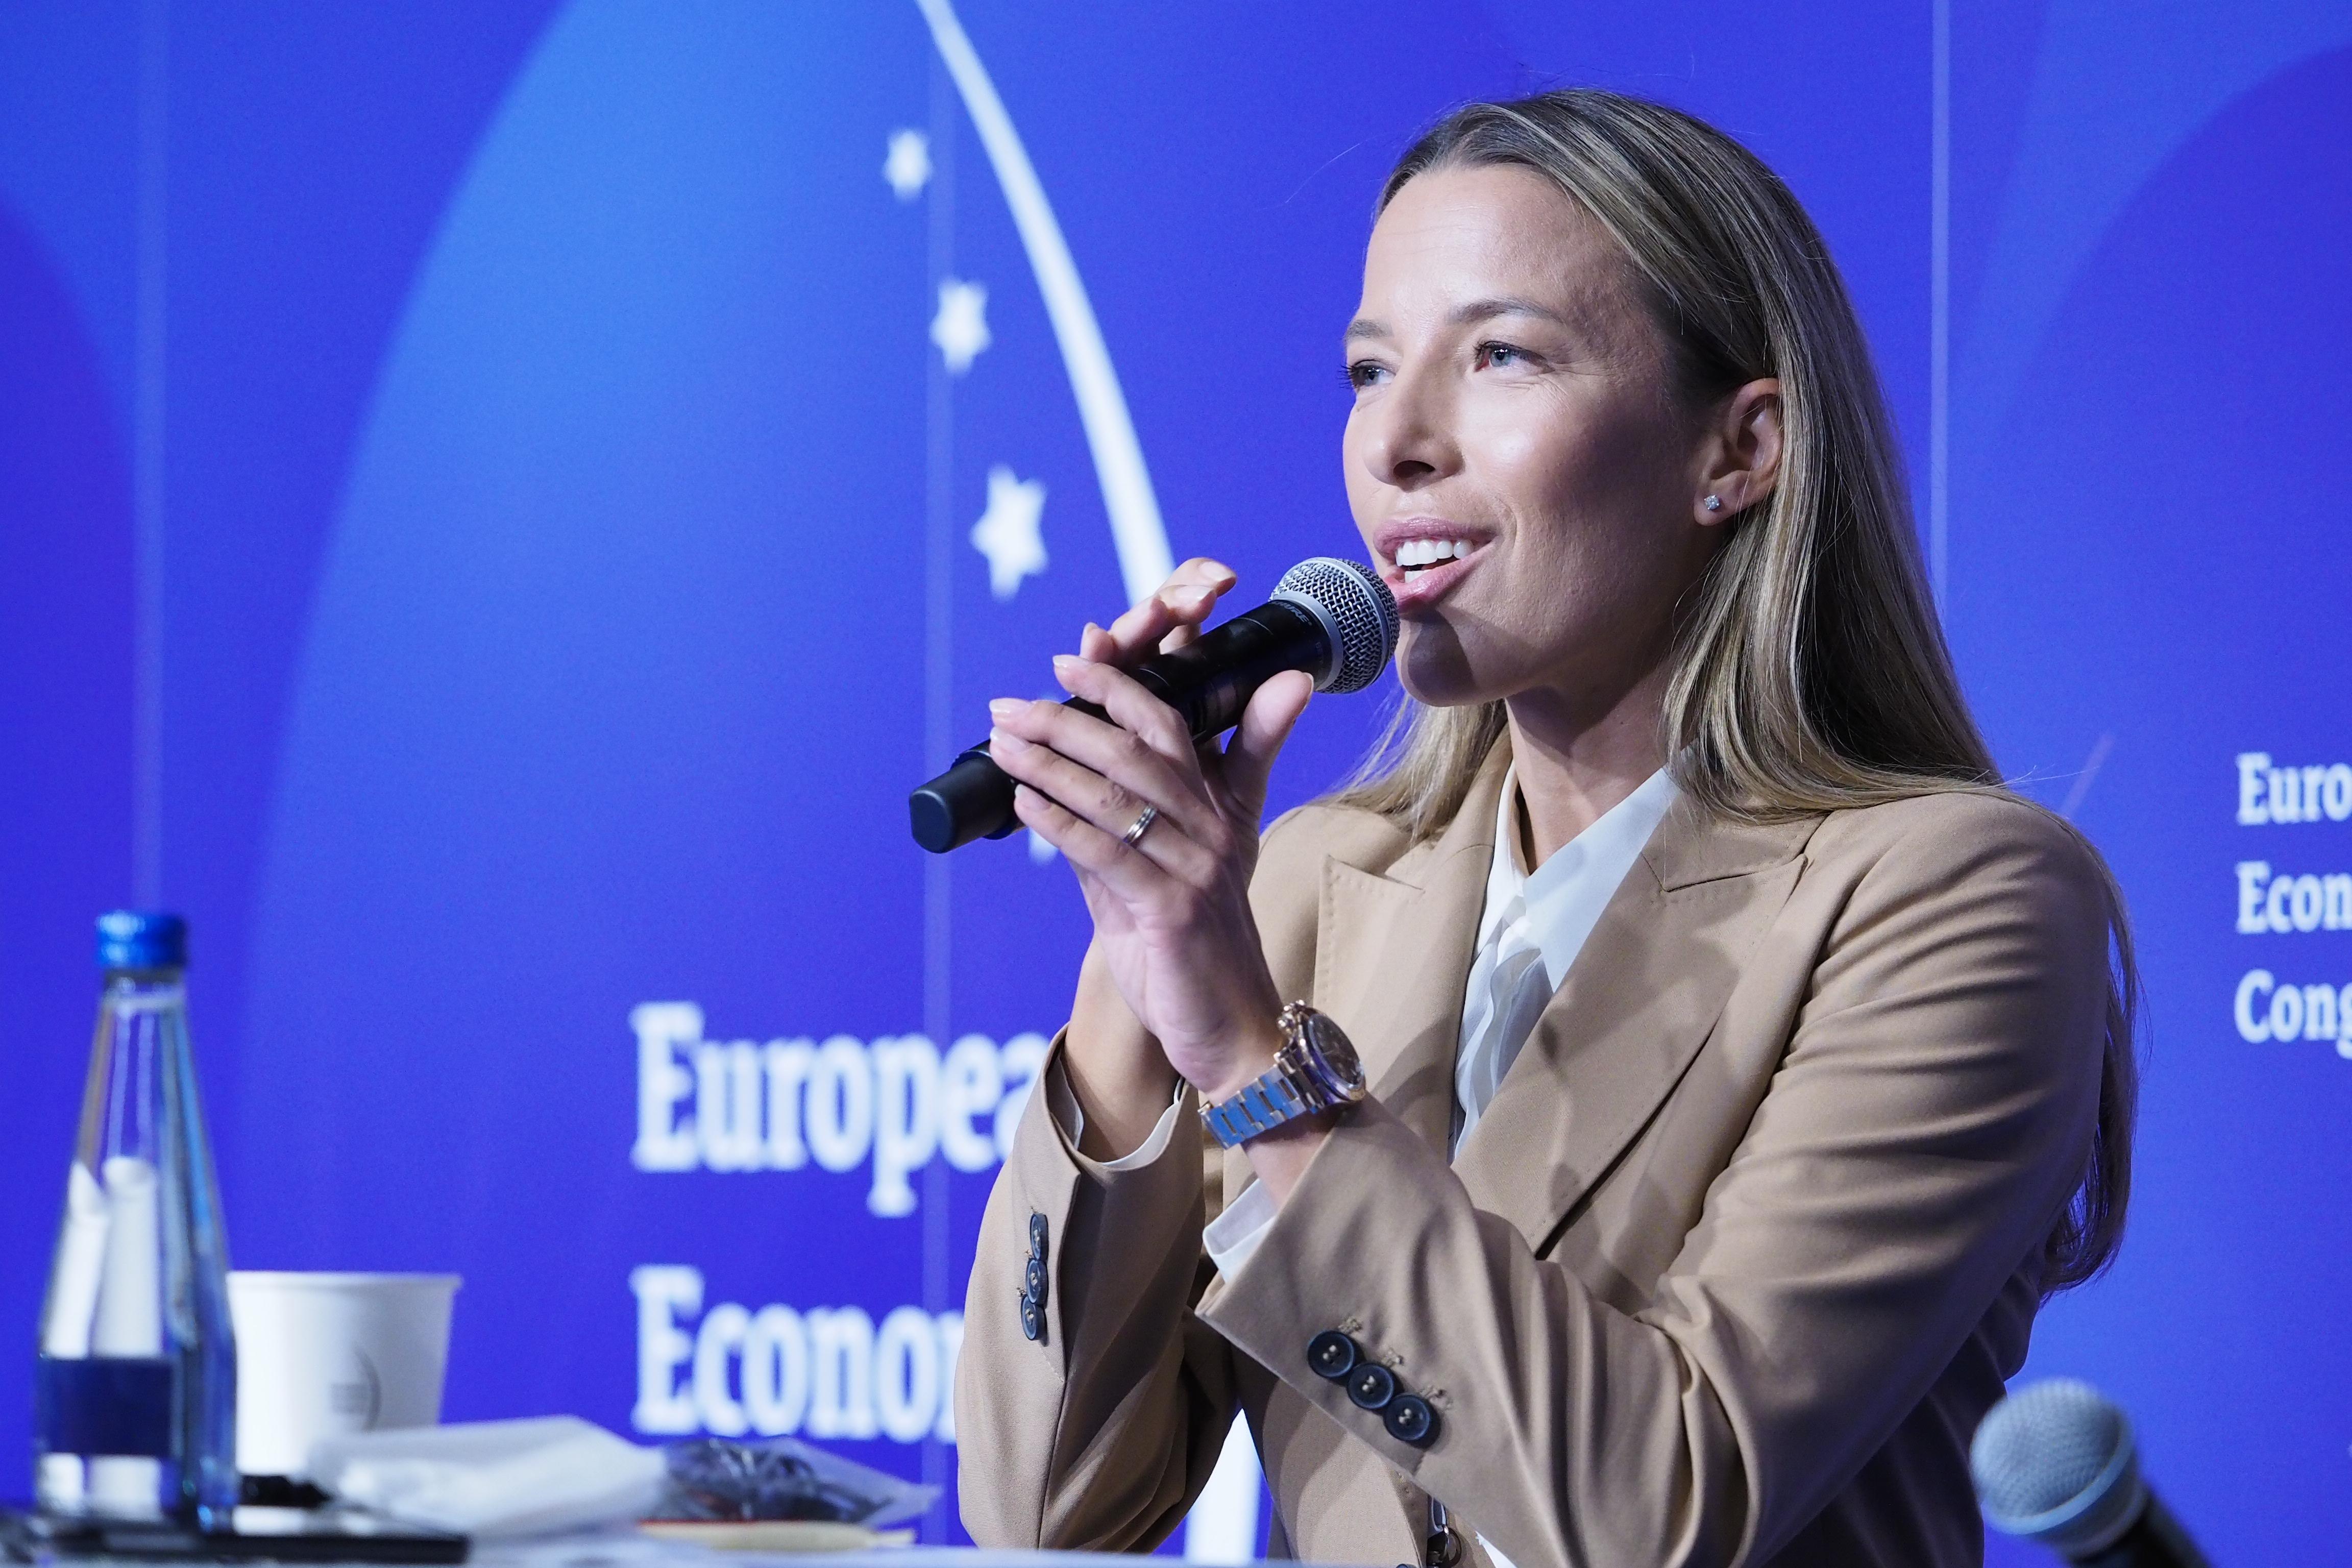 Ewa Chodakowska (fot. PTWP)